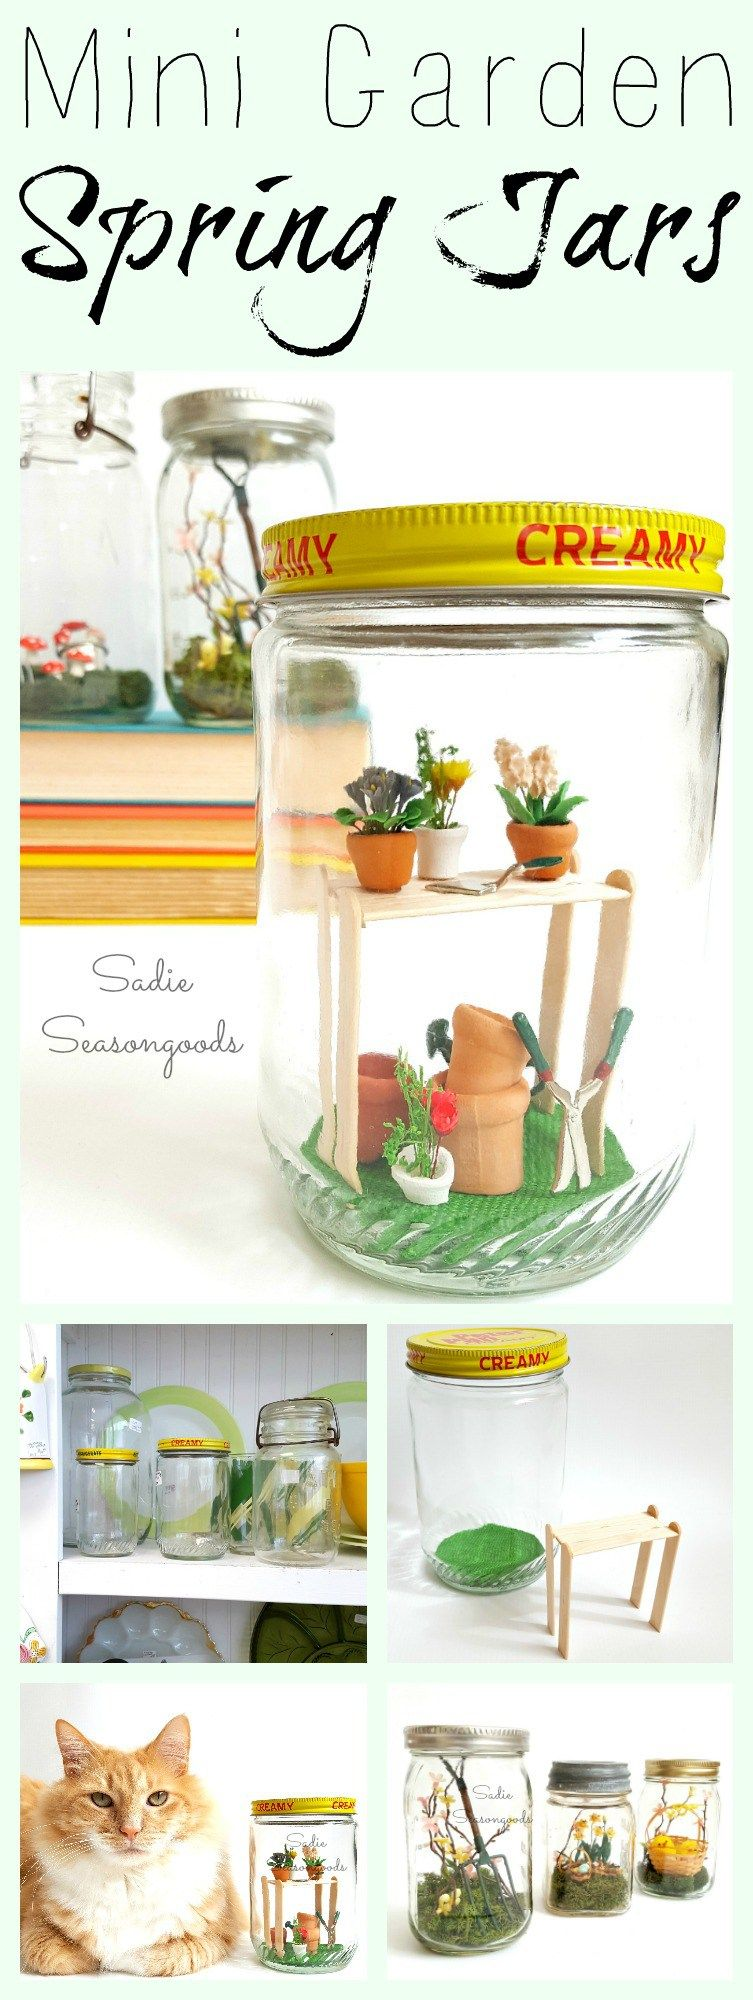 DIY Spring garden decor miniatures in repurposed vintage glass mason jars by Sadie Seasongoods / www.sadieseasongoods.com